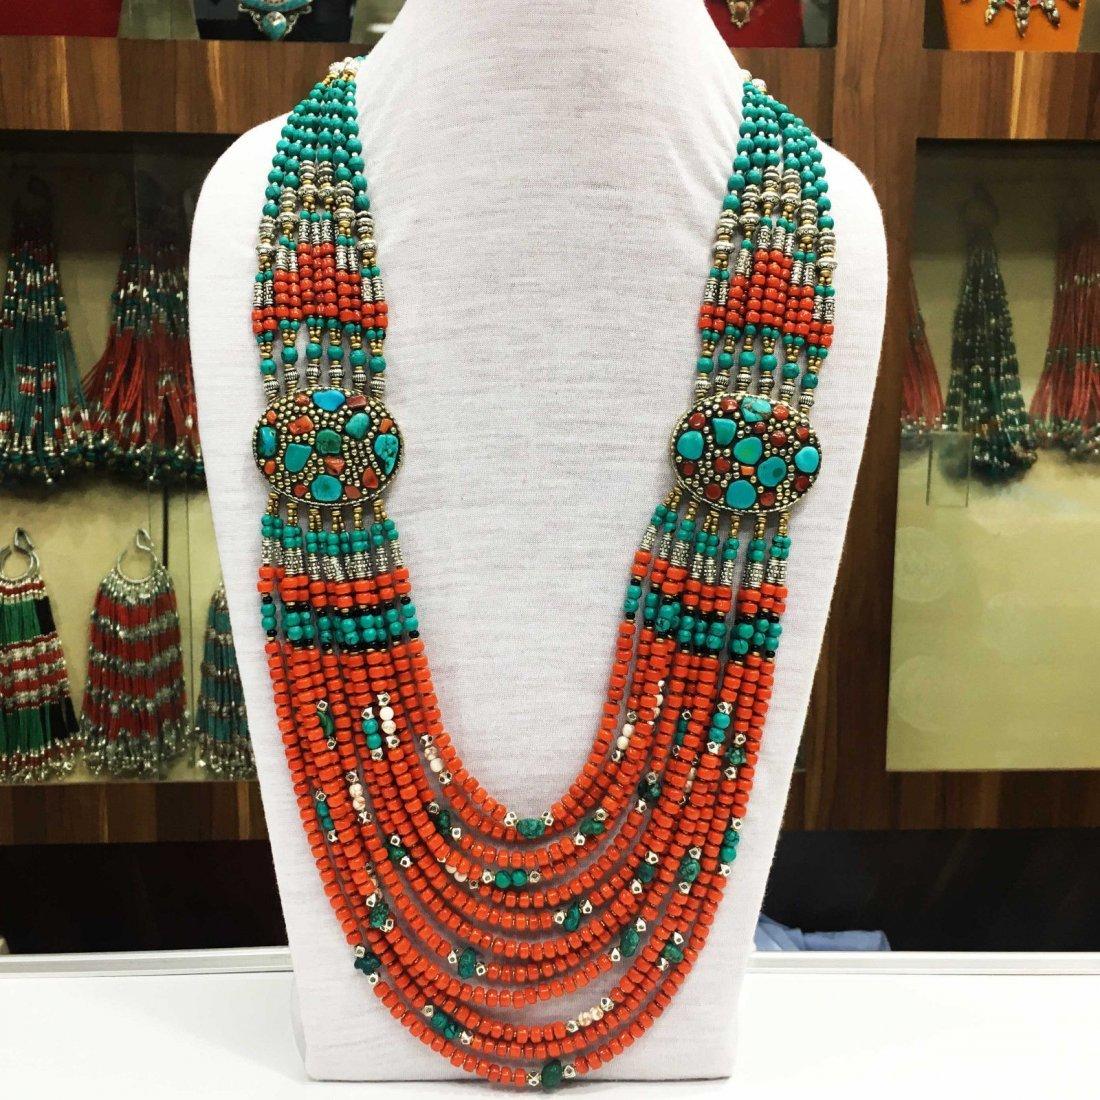 Tibetan & Nepalese Tibetan Silver Women's Necklace